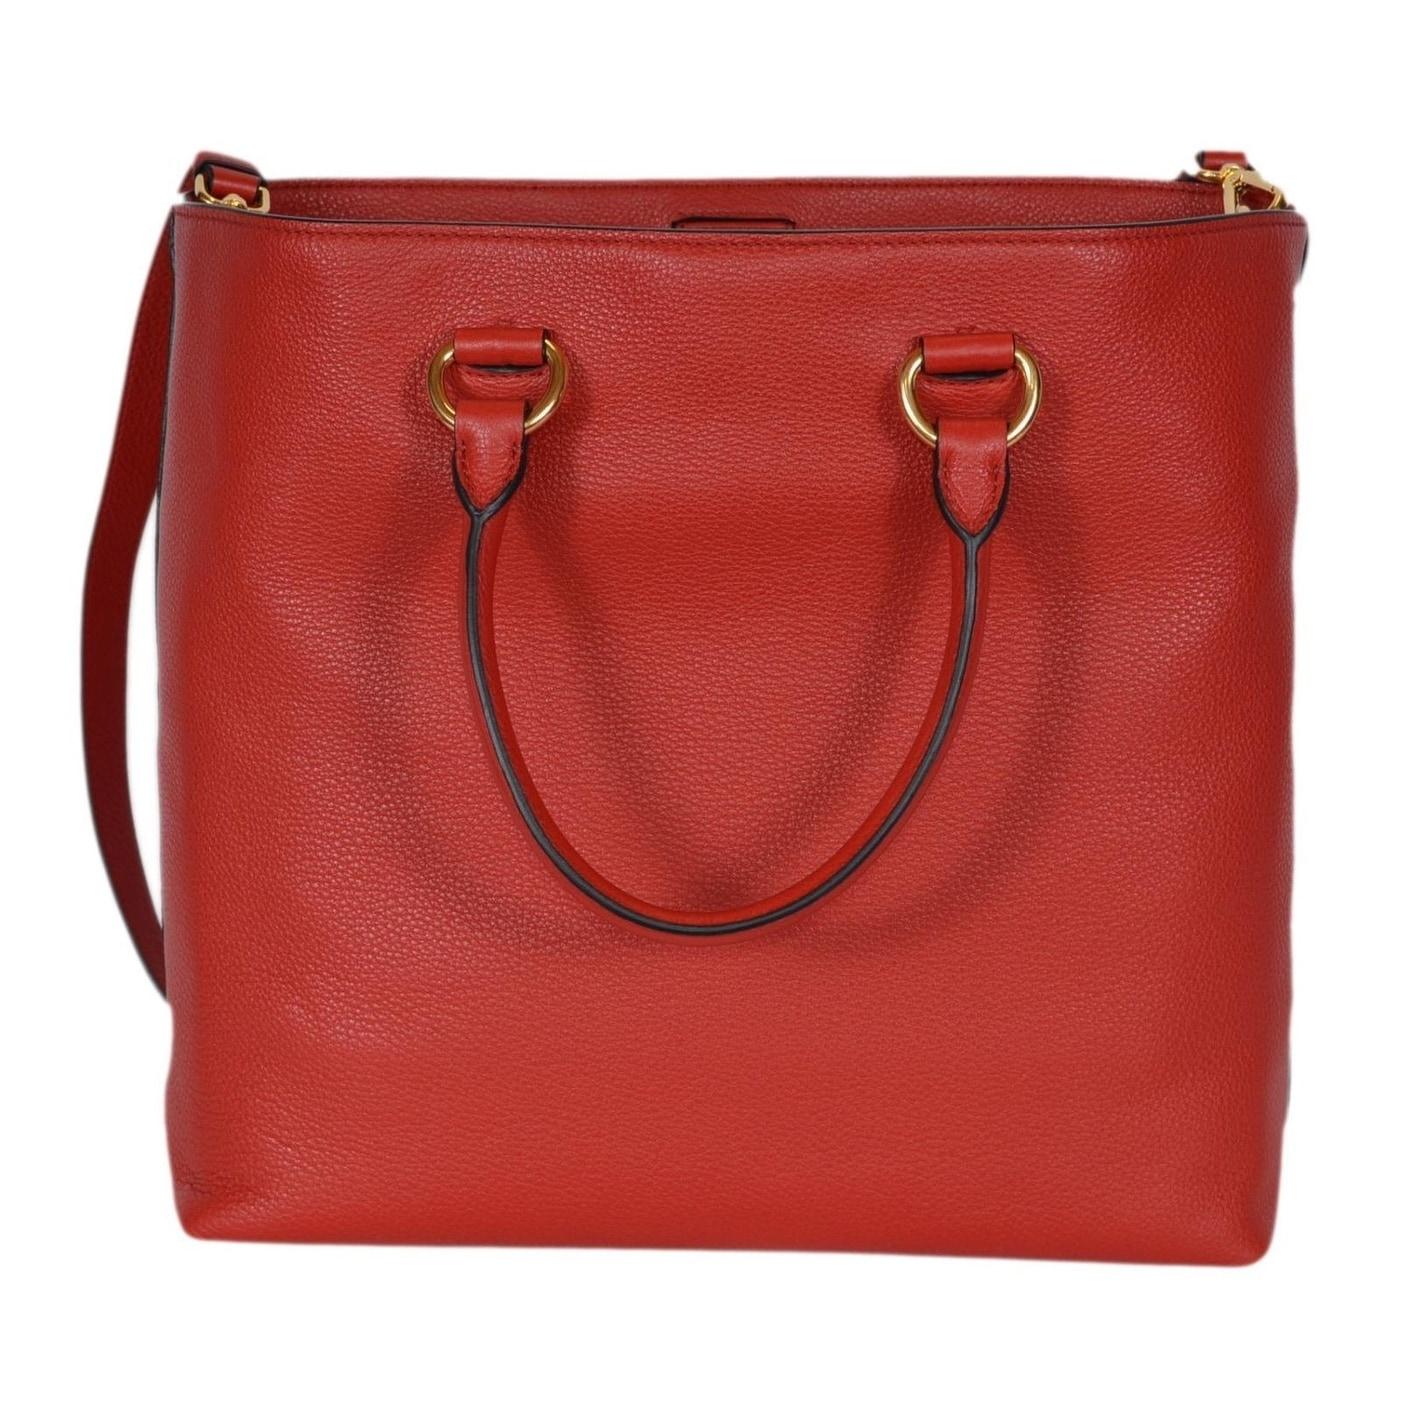 0d504f5eebd Prada 1BG865 Red Leather Vitello Phenix Convertible Tote Handbag Shopper -  13.77